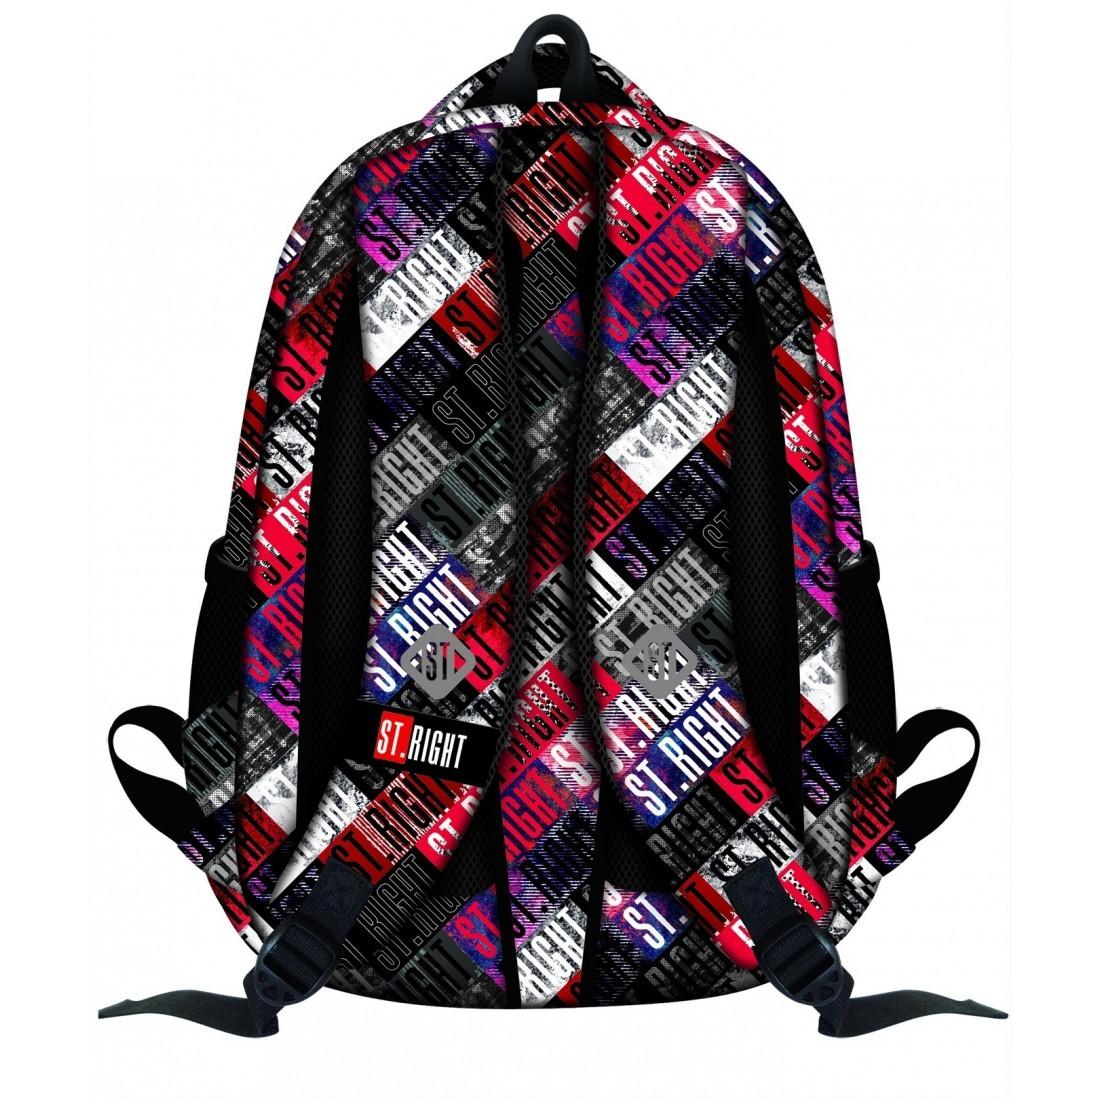 Plecak szkolny 23 ST.RIGHT ST.GRUNGE napisy fullprint młodzieżowy styl - plecak-tornister.pl